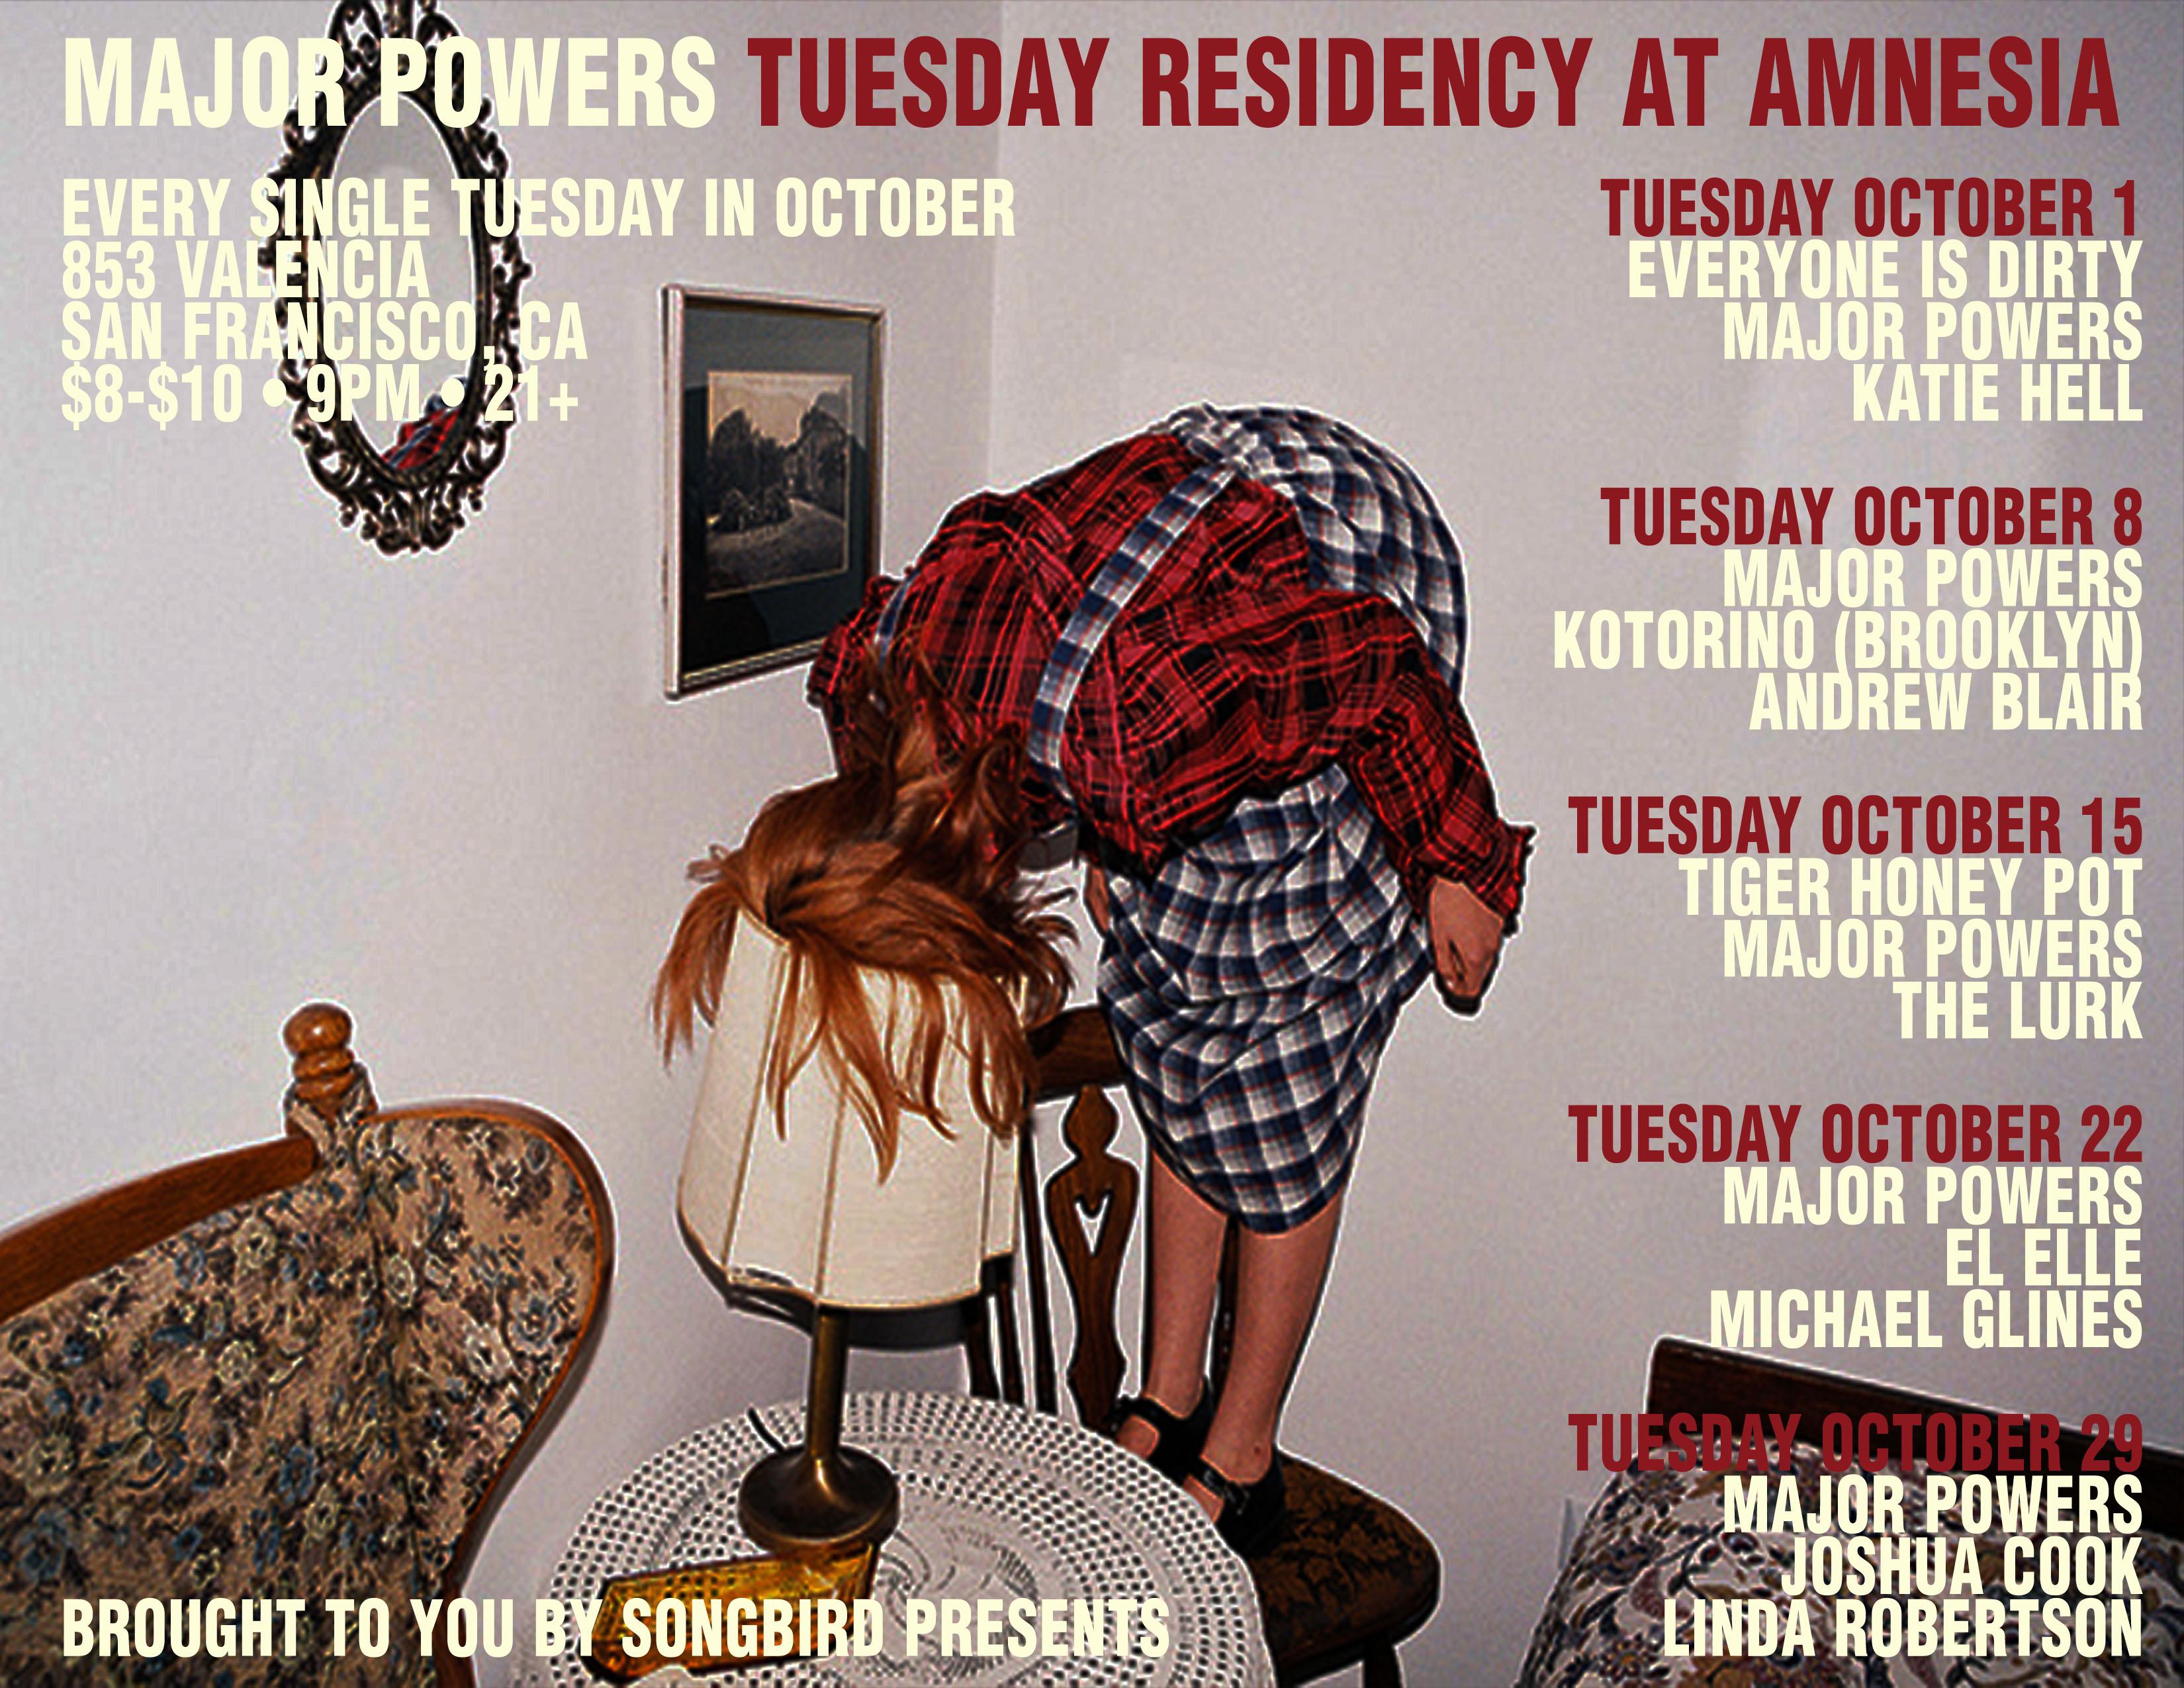 amnesia-10-13 Residency